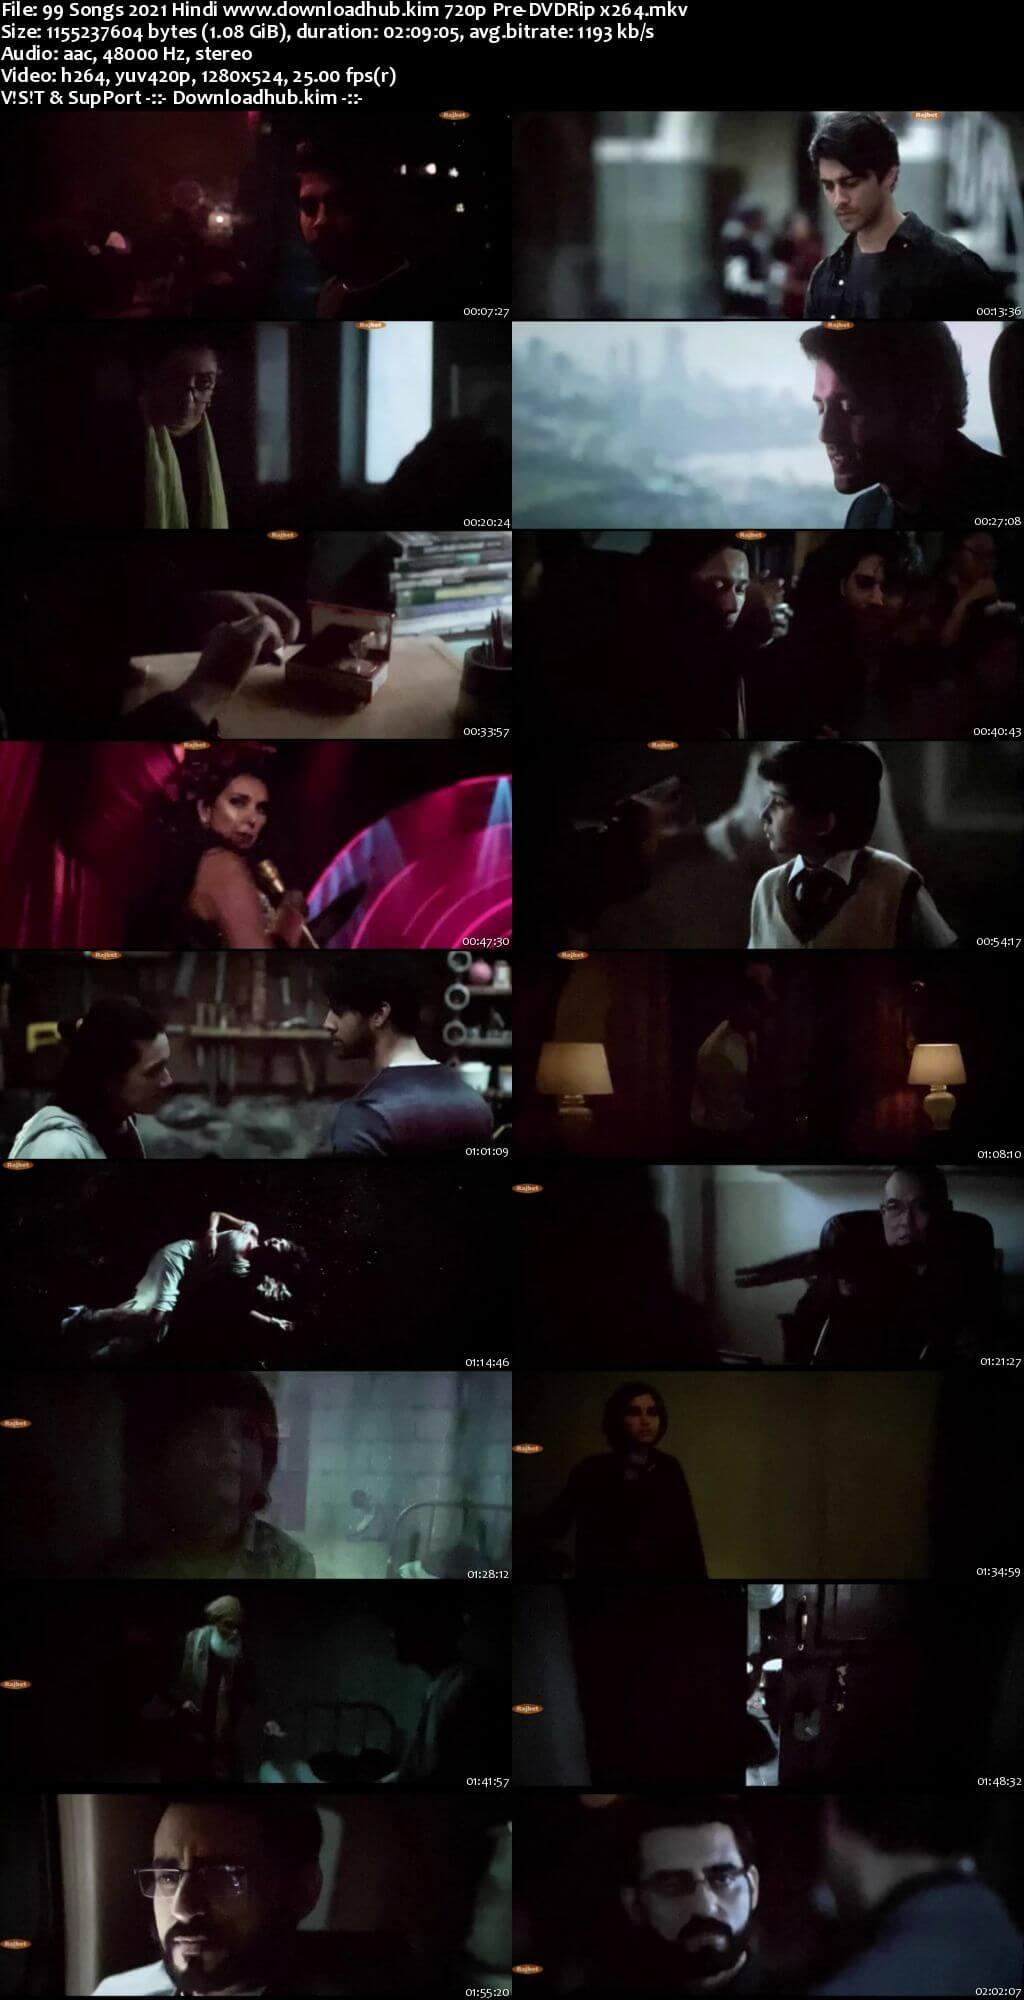 99 Songs 2021 Hindi 720p 480p Pre-DVDRip x264